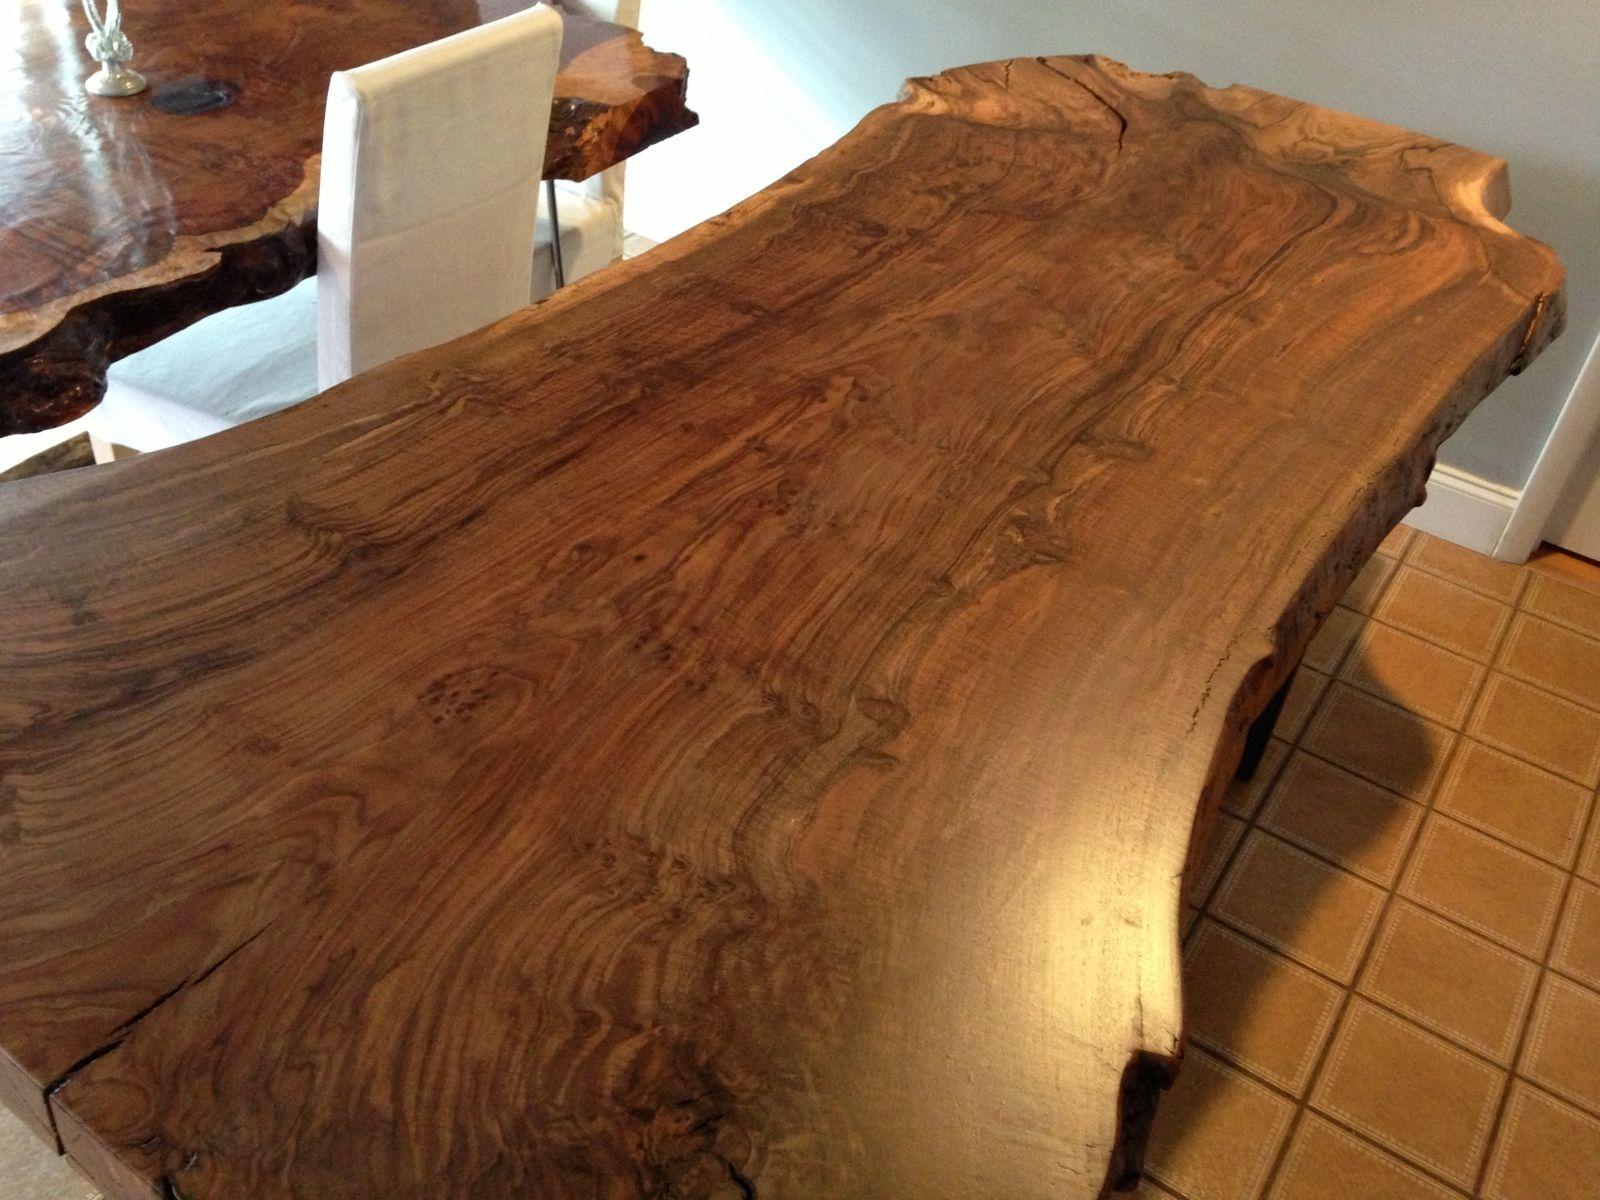 Handmade Live Edge Claro Walnut Dining Table By Ozma Design Custommade